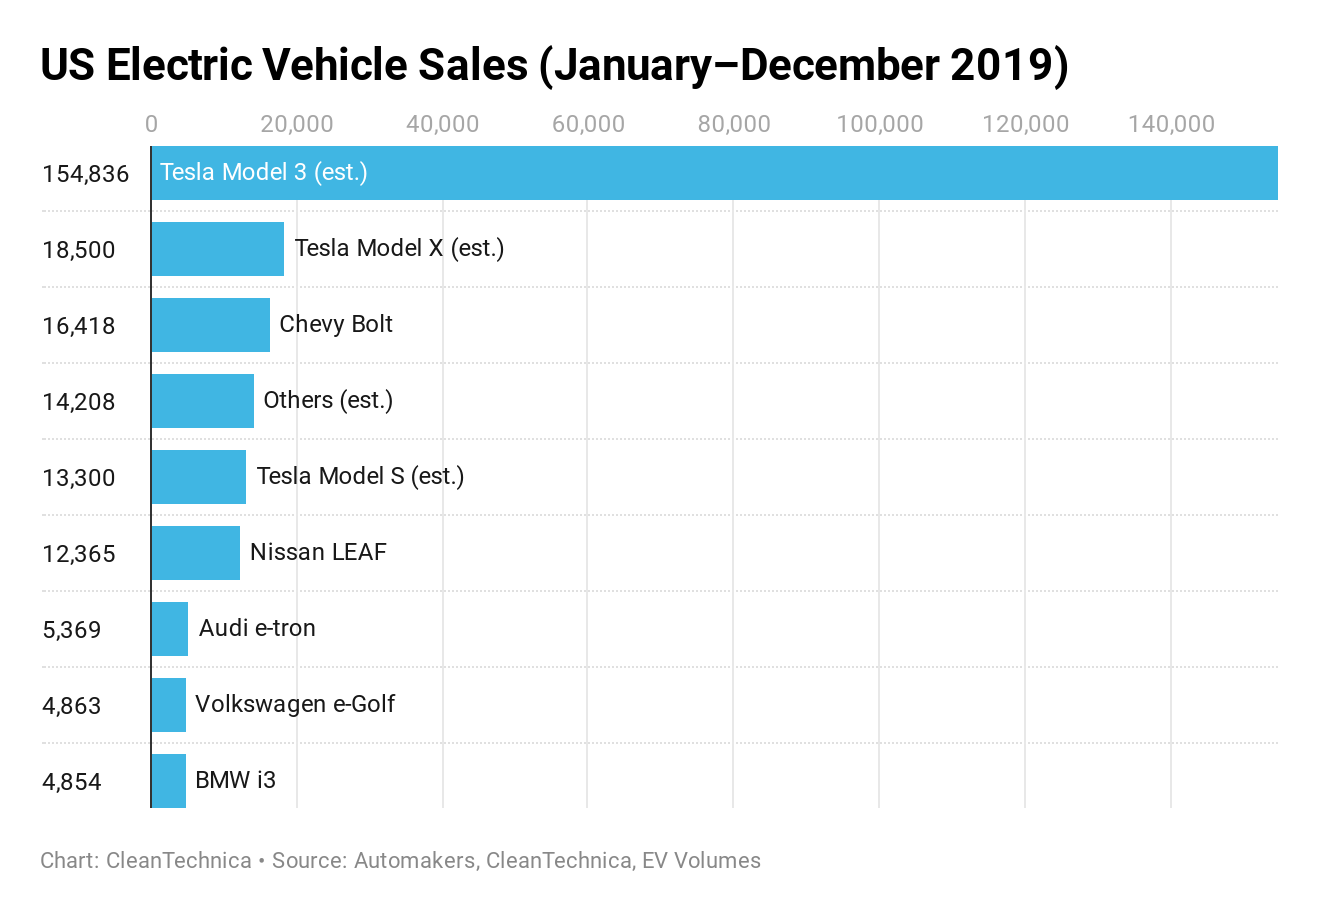 U.S. Electric Vehicle Sales in 2019